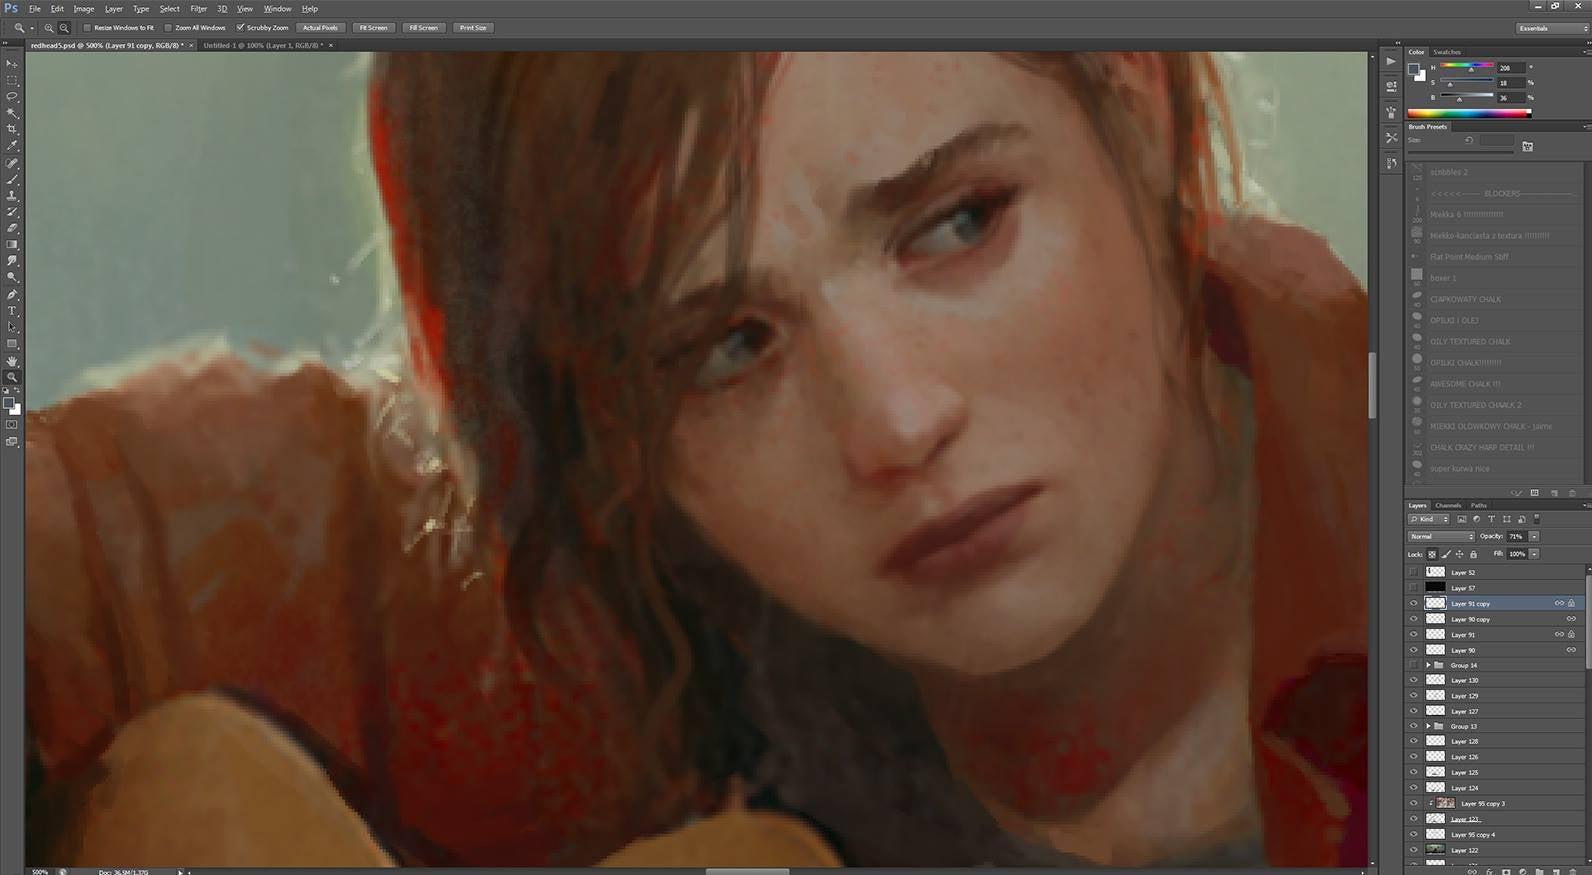 Image for UPDATE: The Last of Us Ellie image is fan art